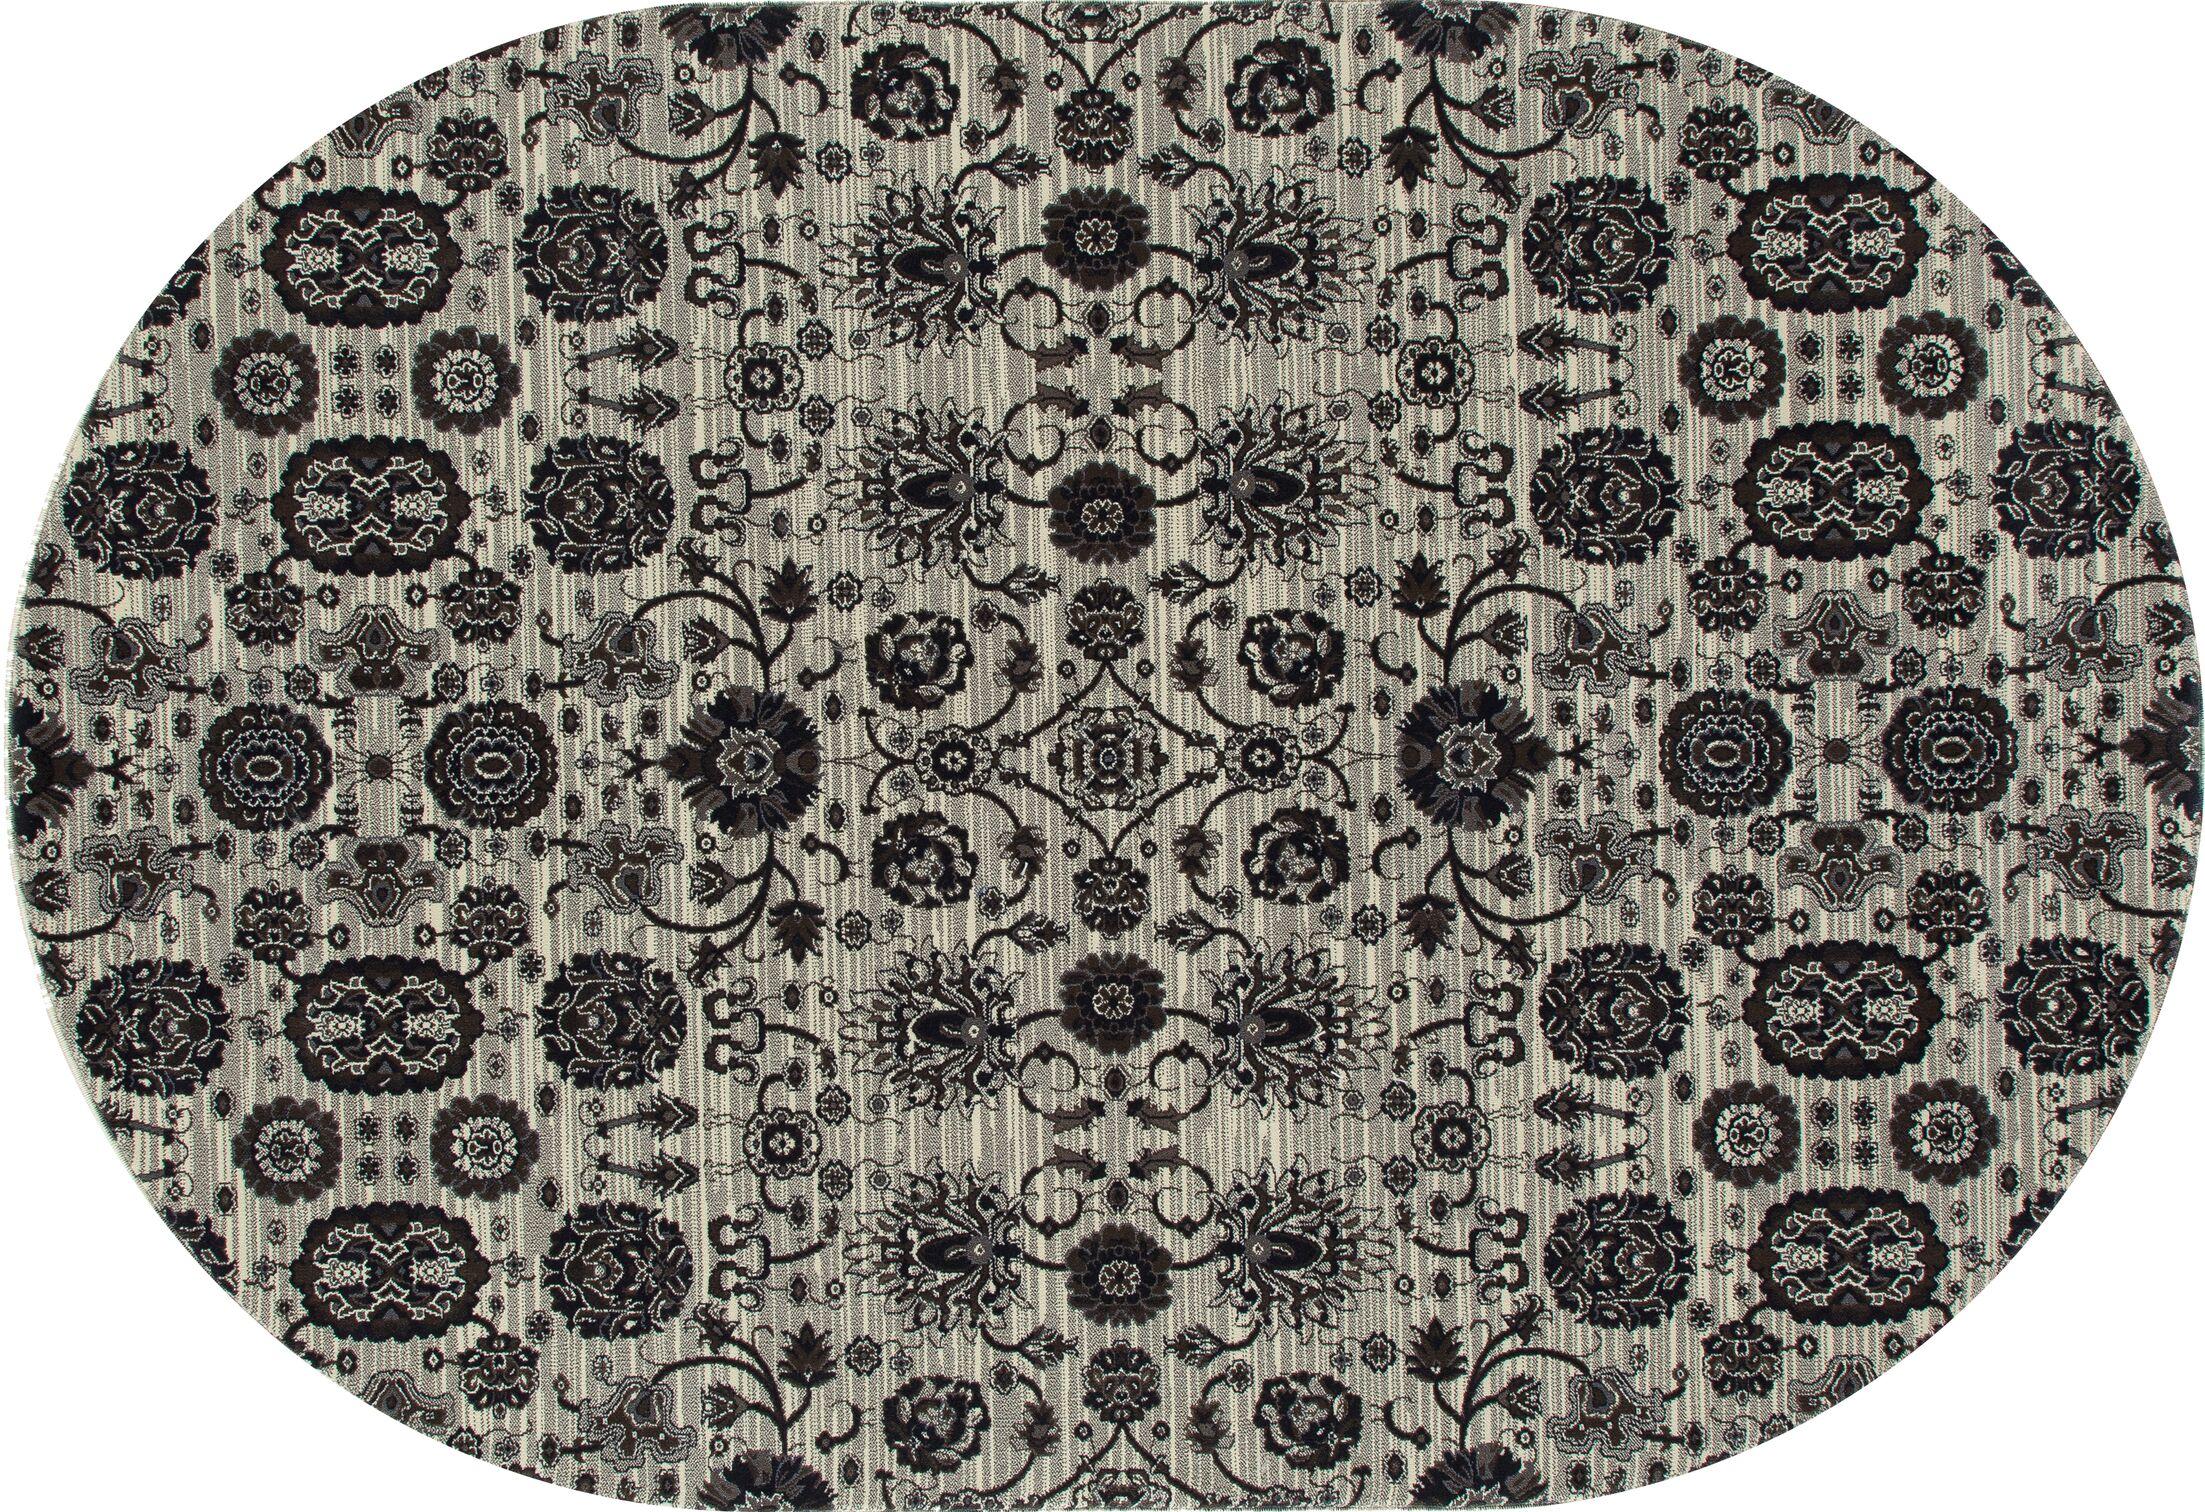 Castellano Cream Area Rug Rug Size: OVAL 6'7 x 9'10